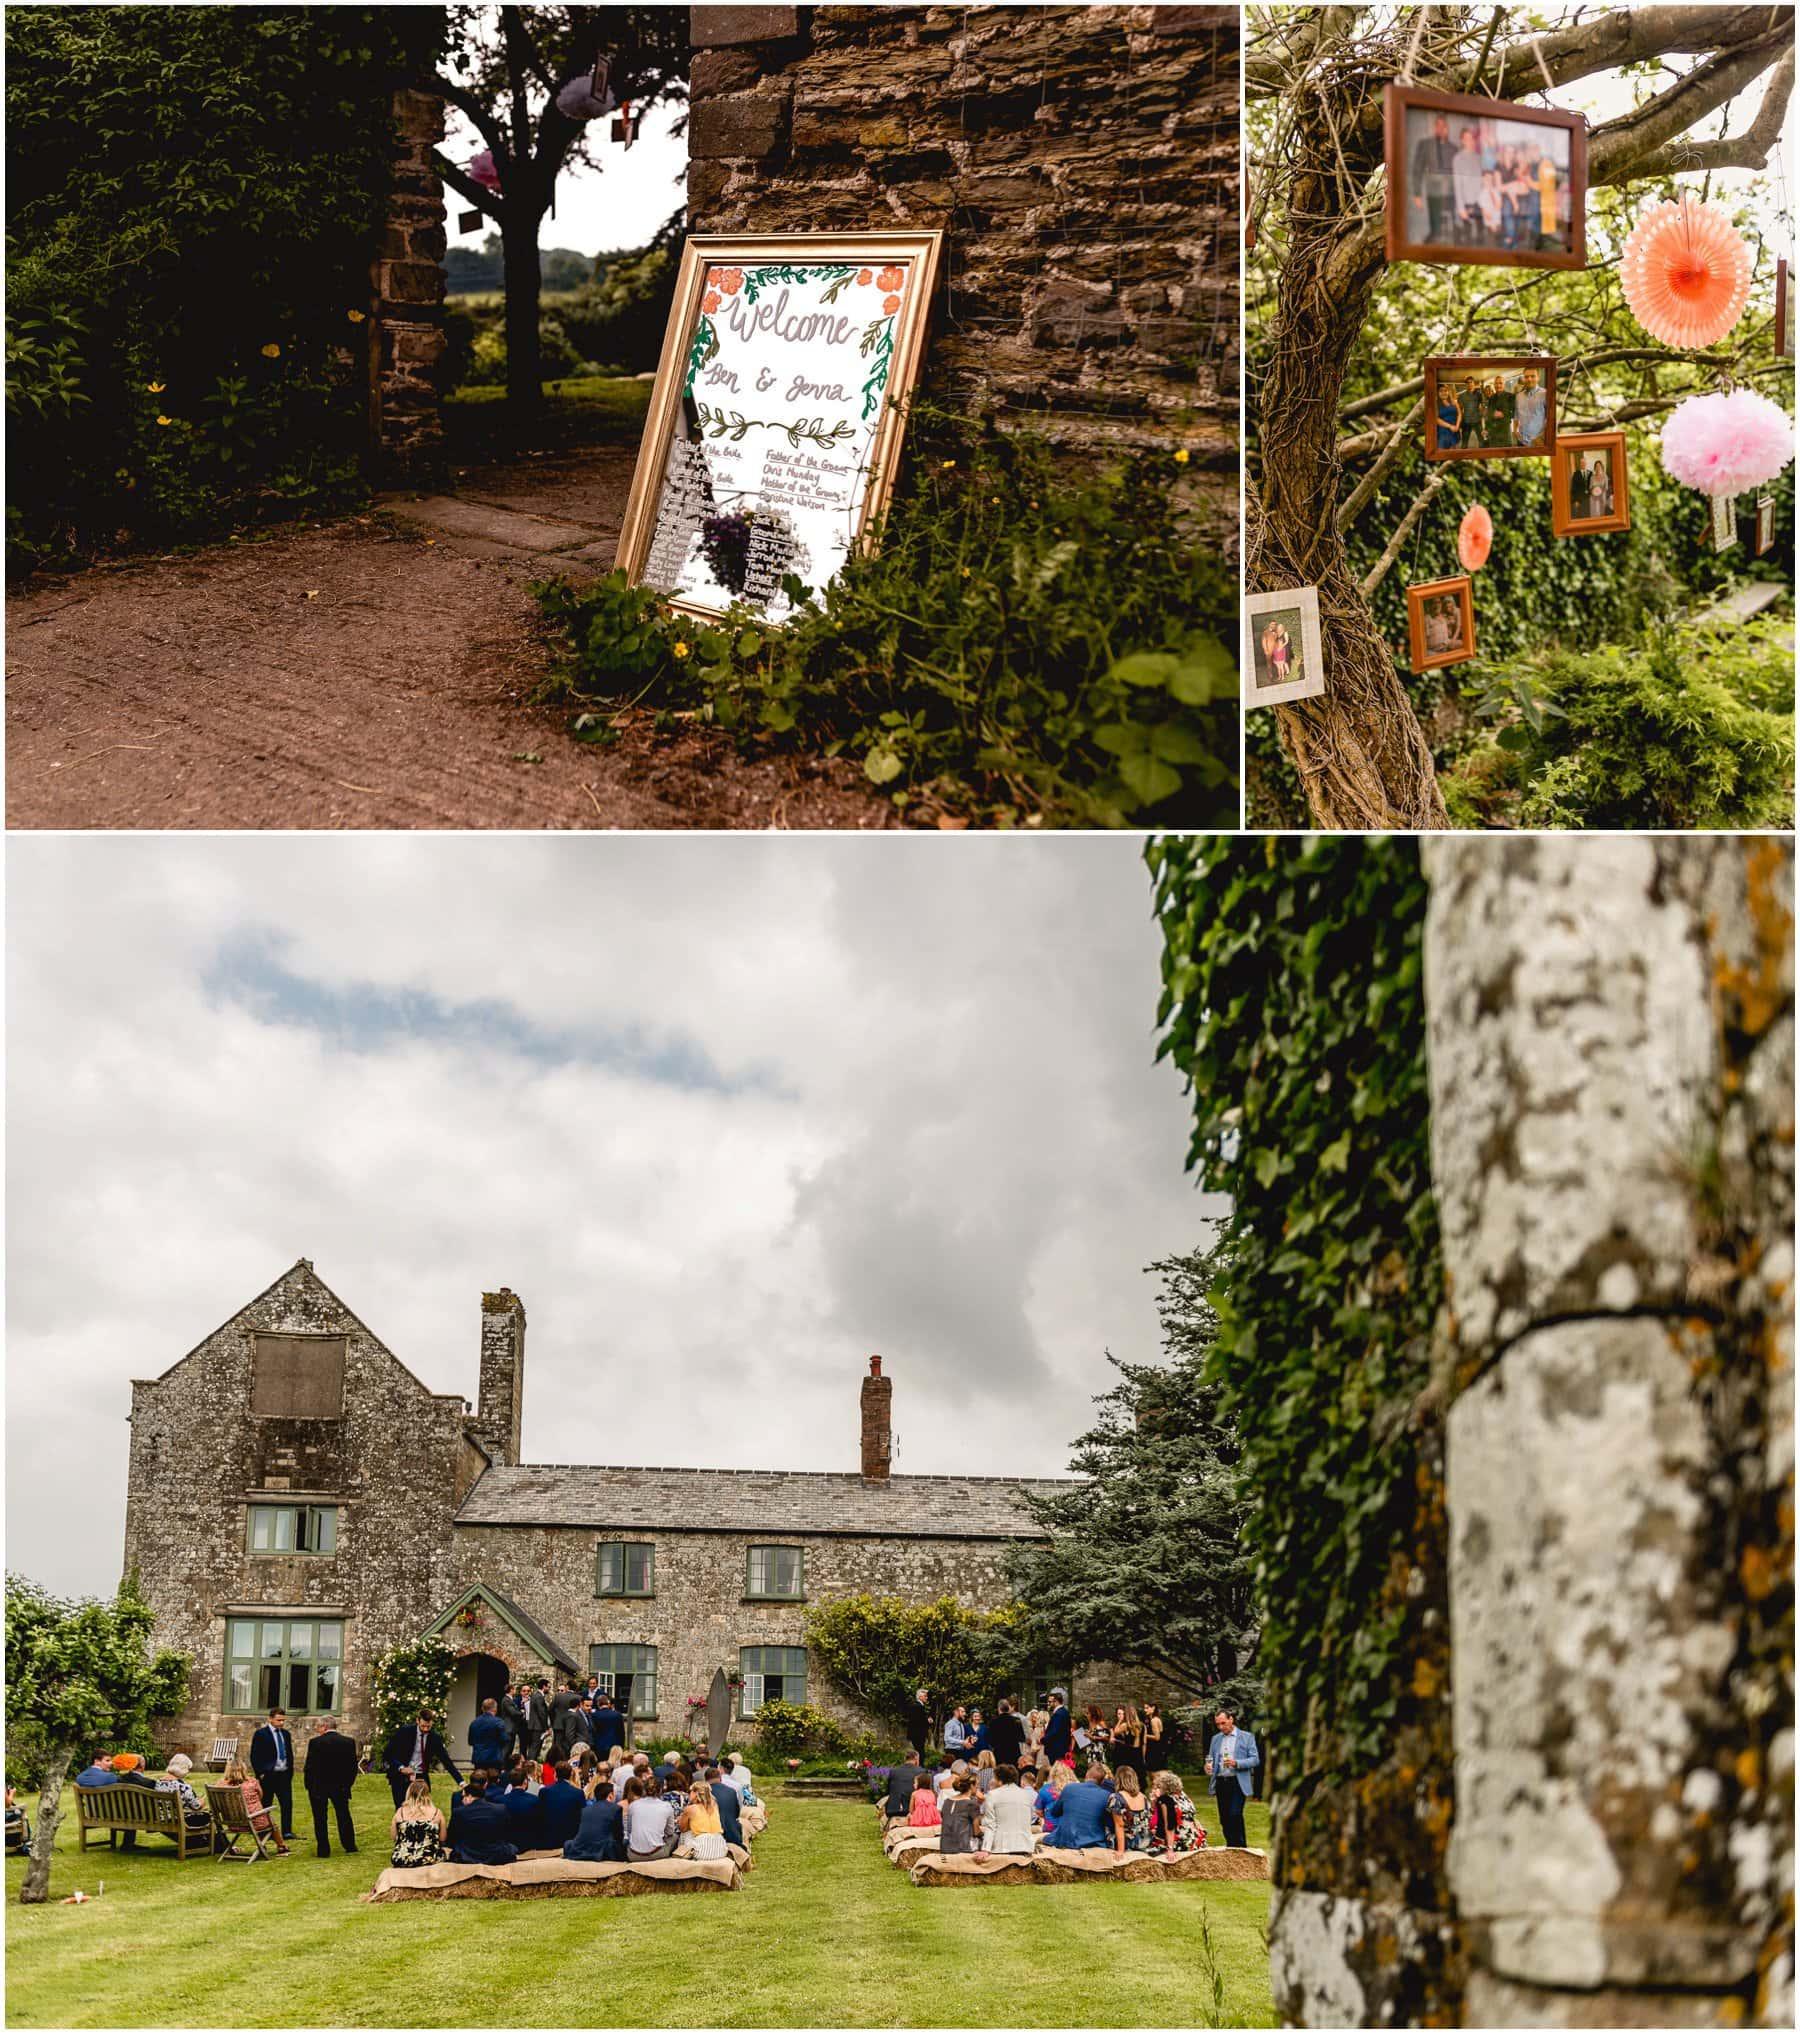 Exterior details before a wedding at The Ash Barton Estate in Devon.